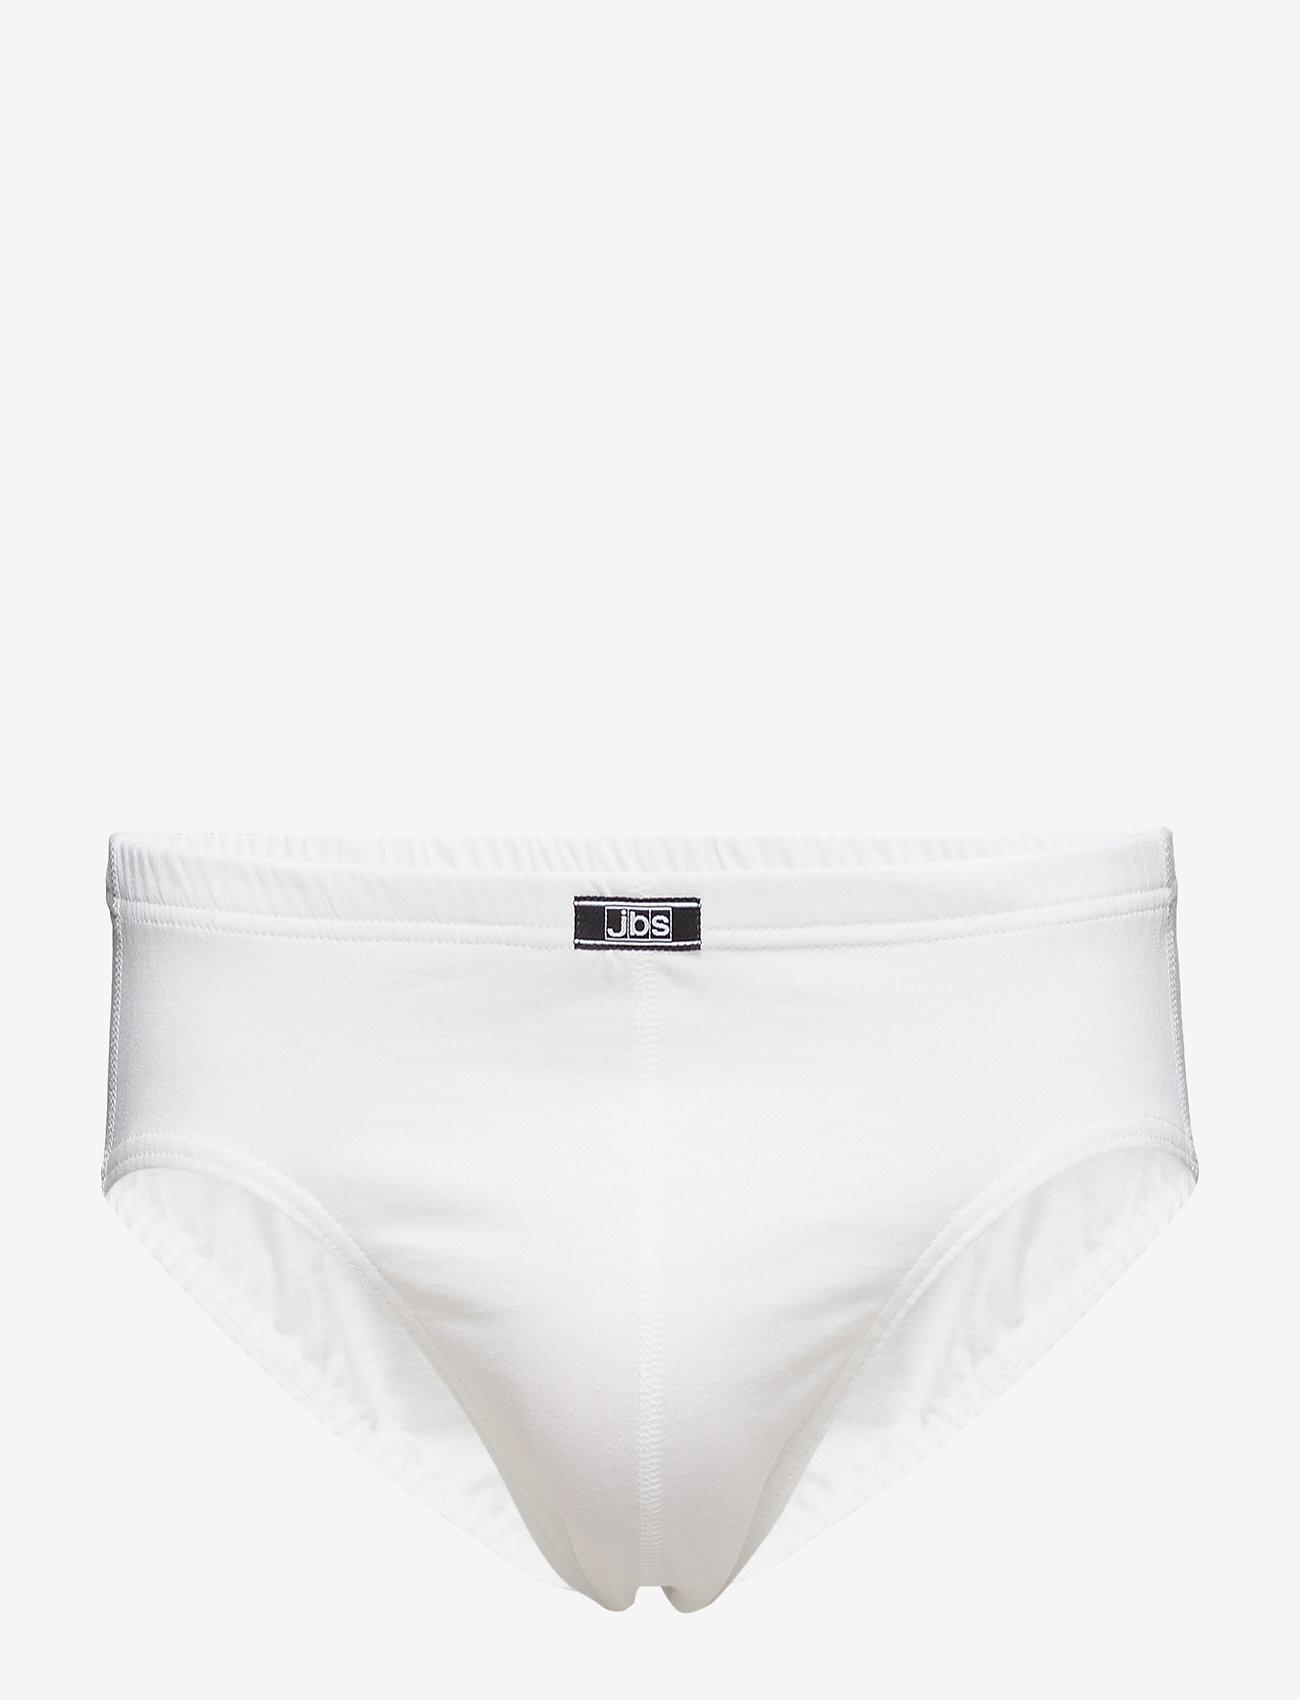 JBS - JBS mini slip - briefs - white - 0